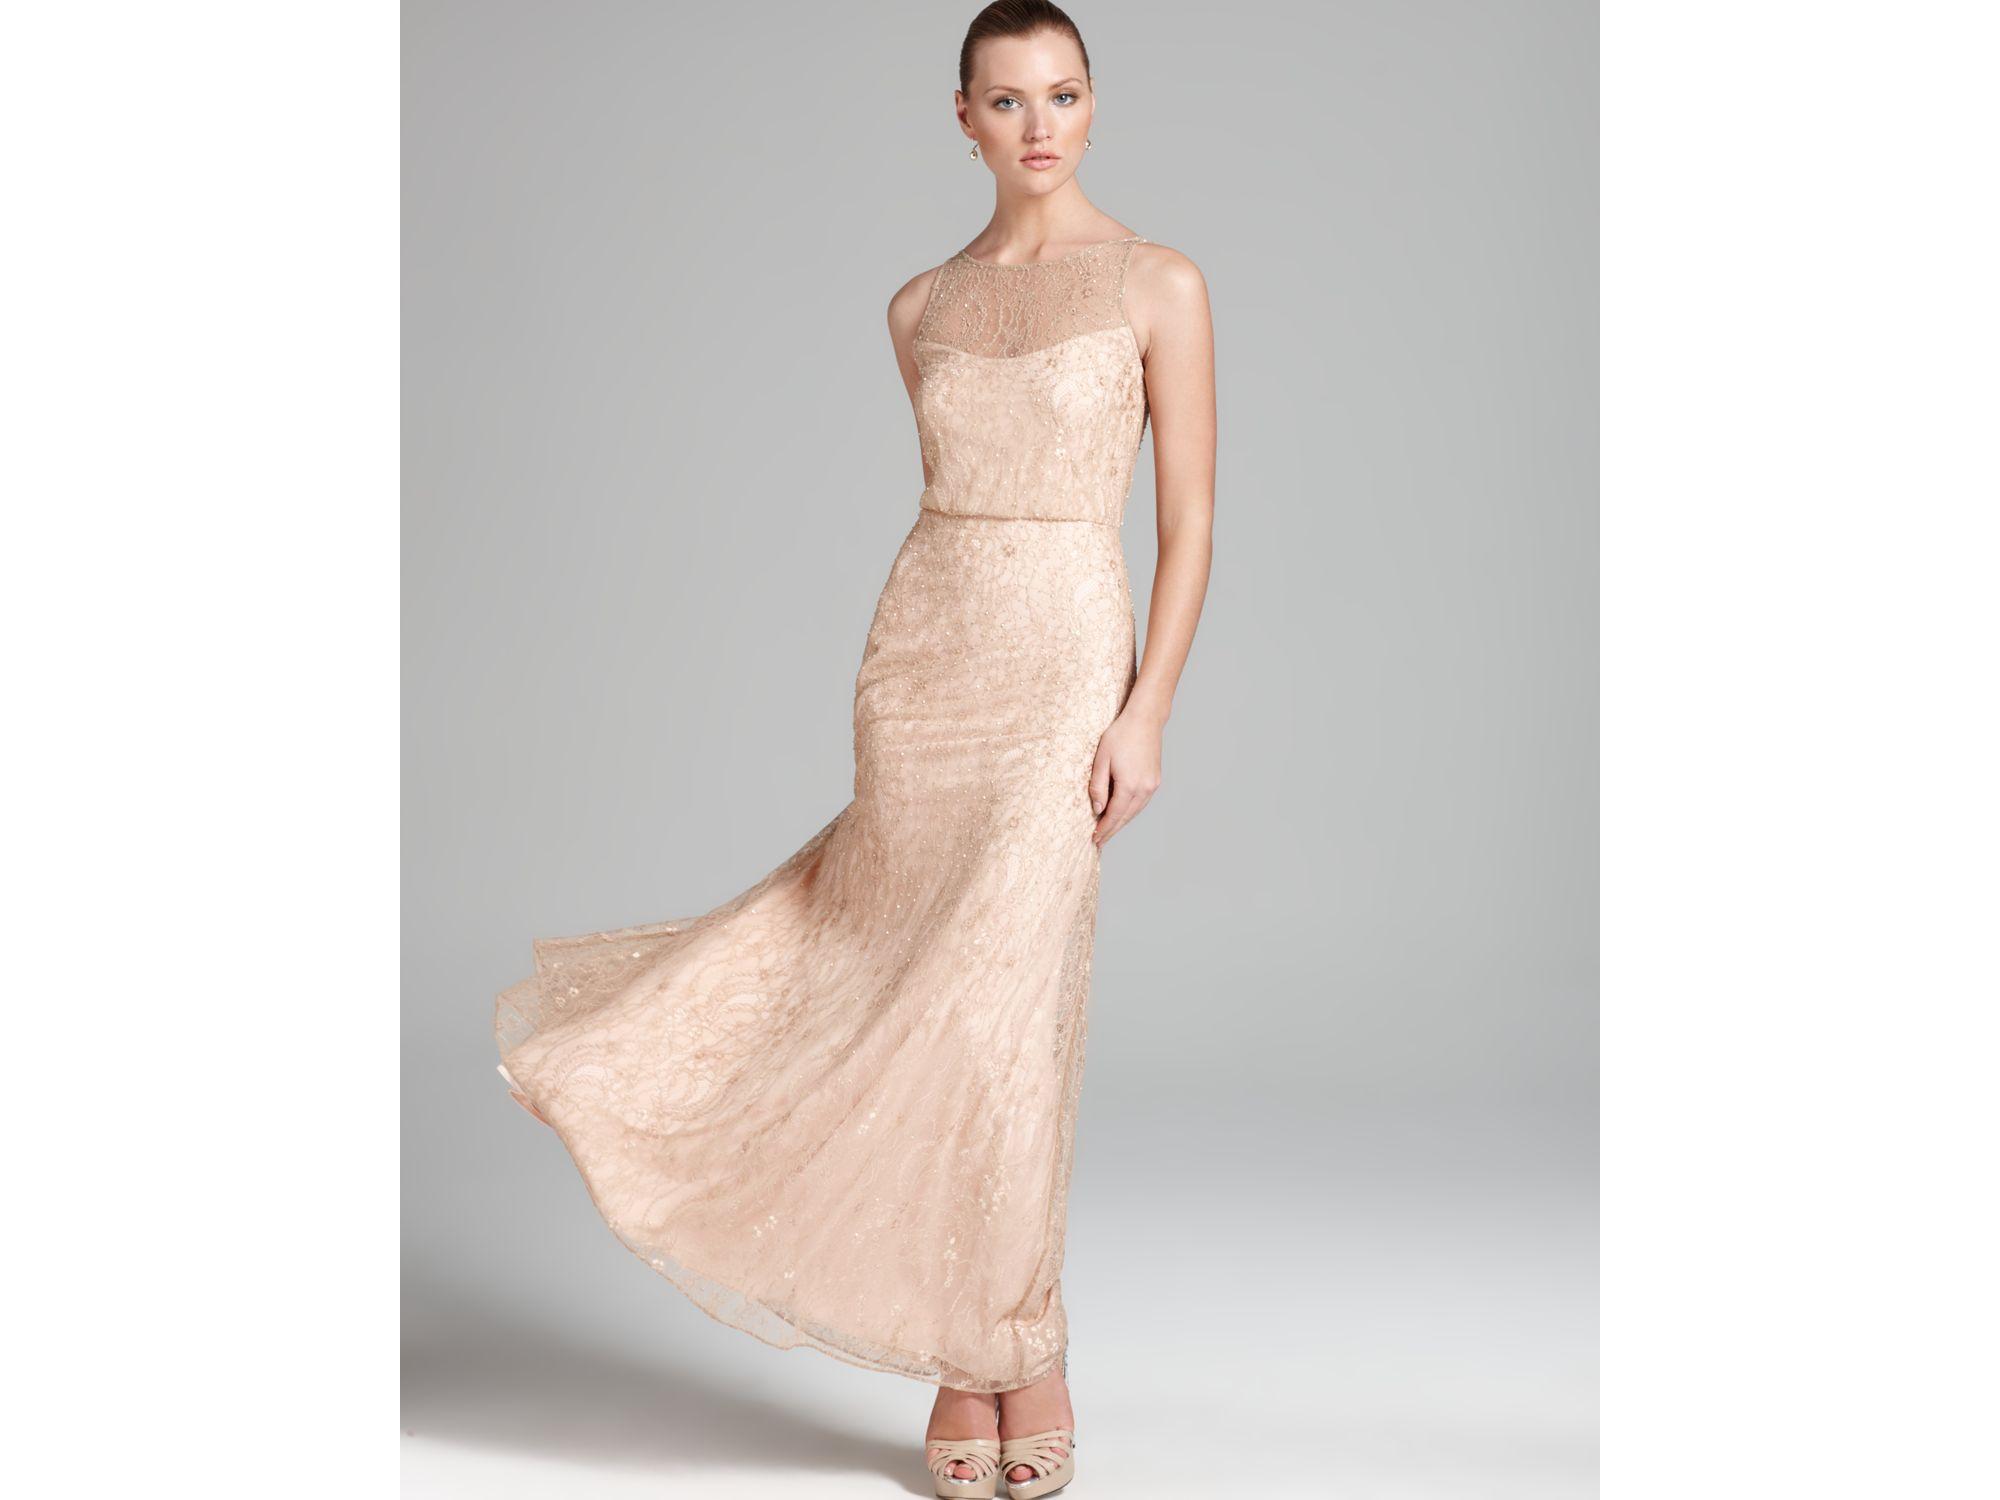 Lyst - Aidan Mattox Blouson Gown Sleeveless Beaded in Pink